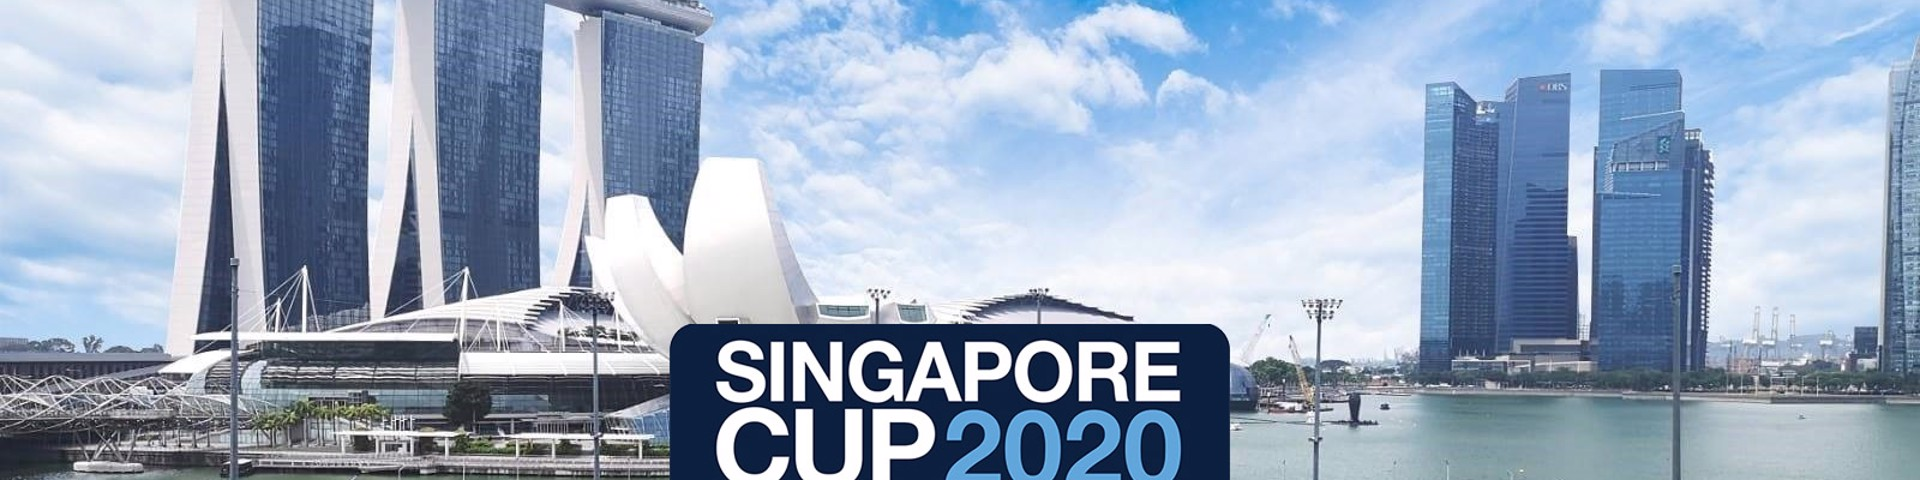 Sungapore Cup 2020